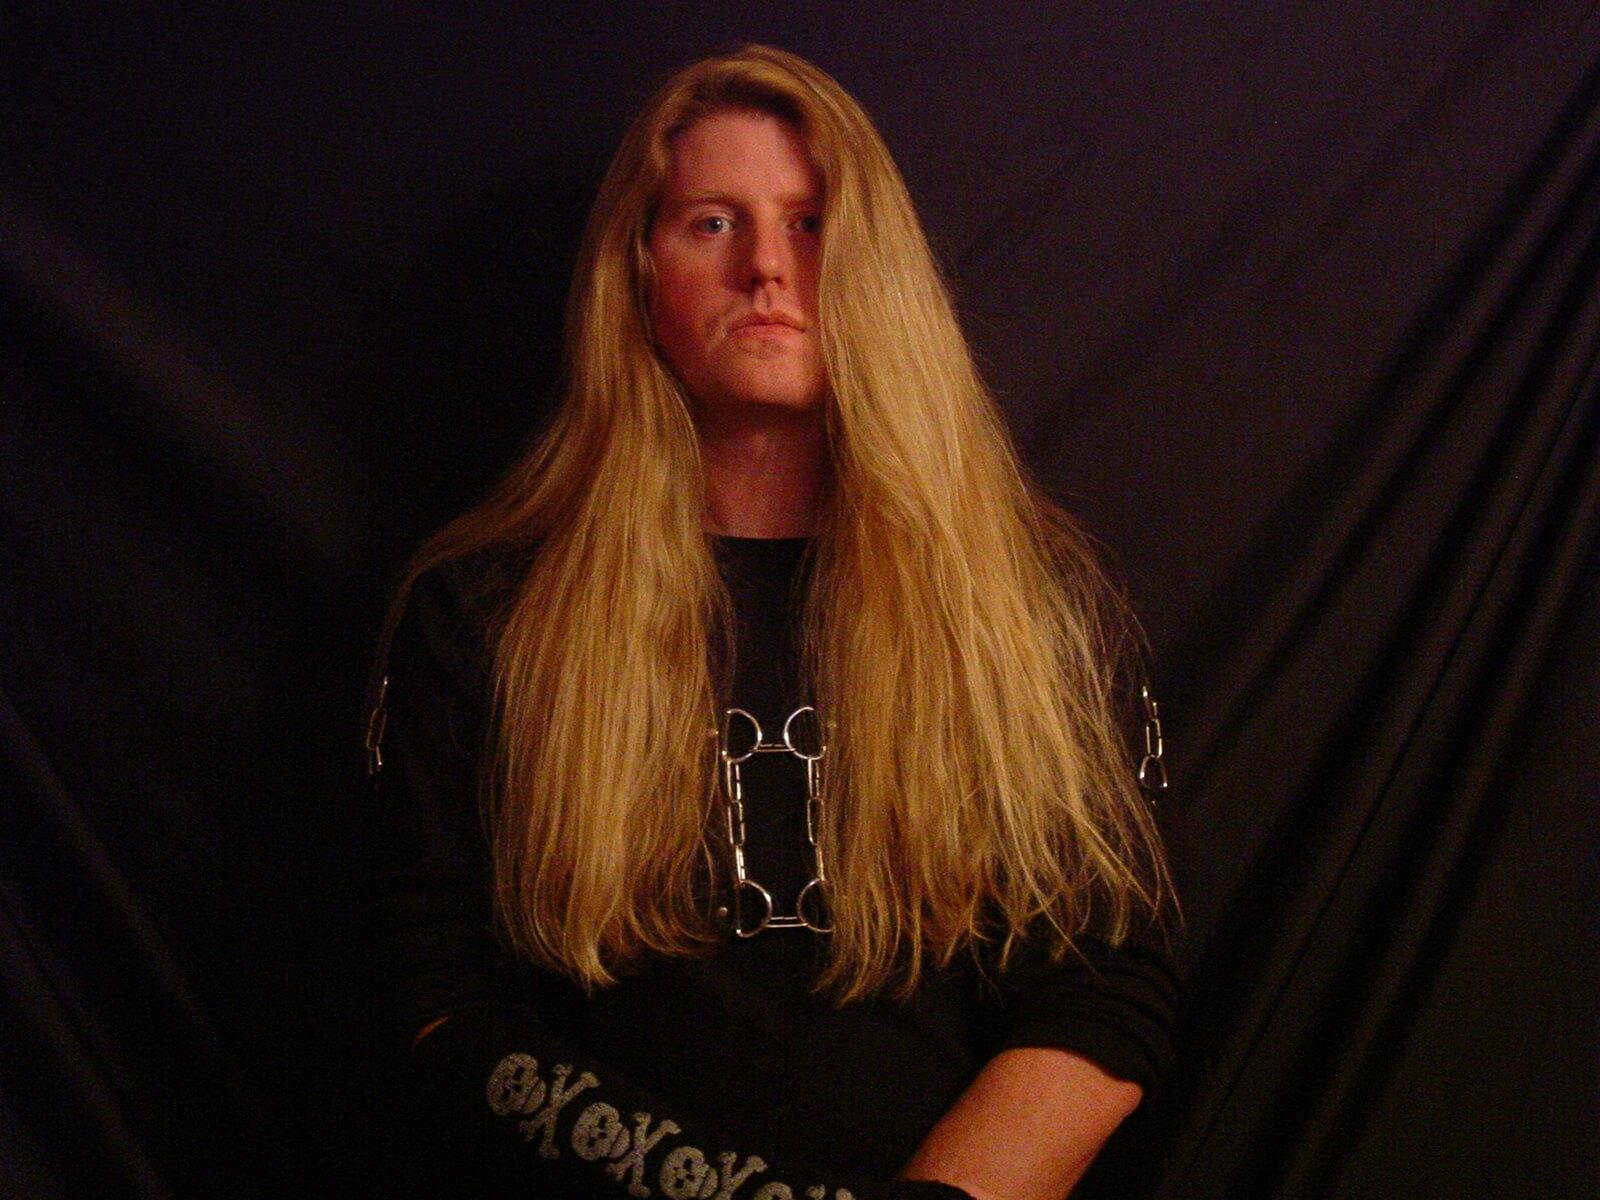 Tom McDyne with DOCTRINE at the PROGPOWER USA photo-shoot